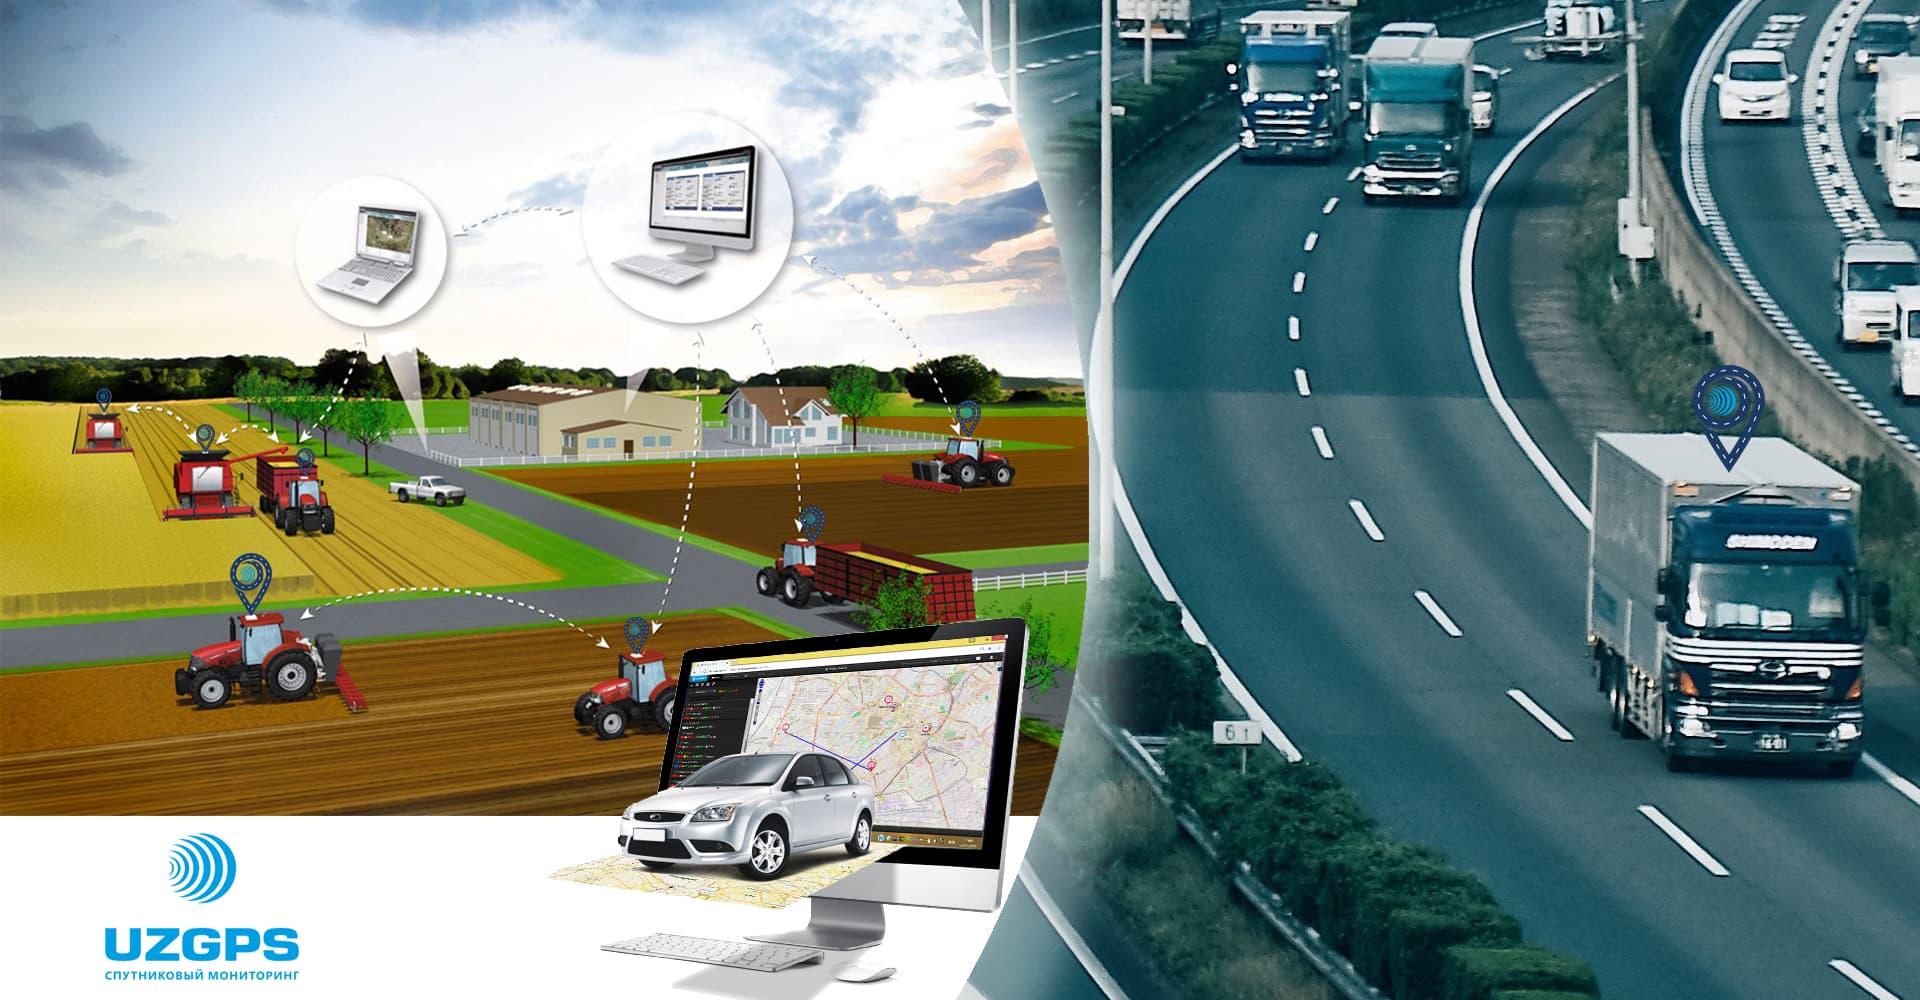 GPS мониторинг и диспетчеризация транспорта